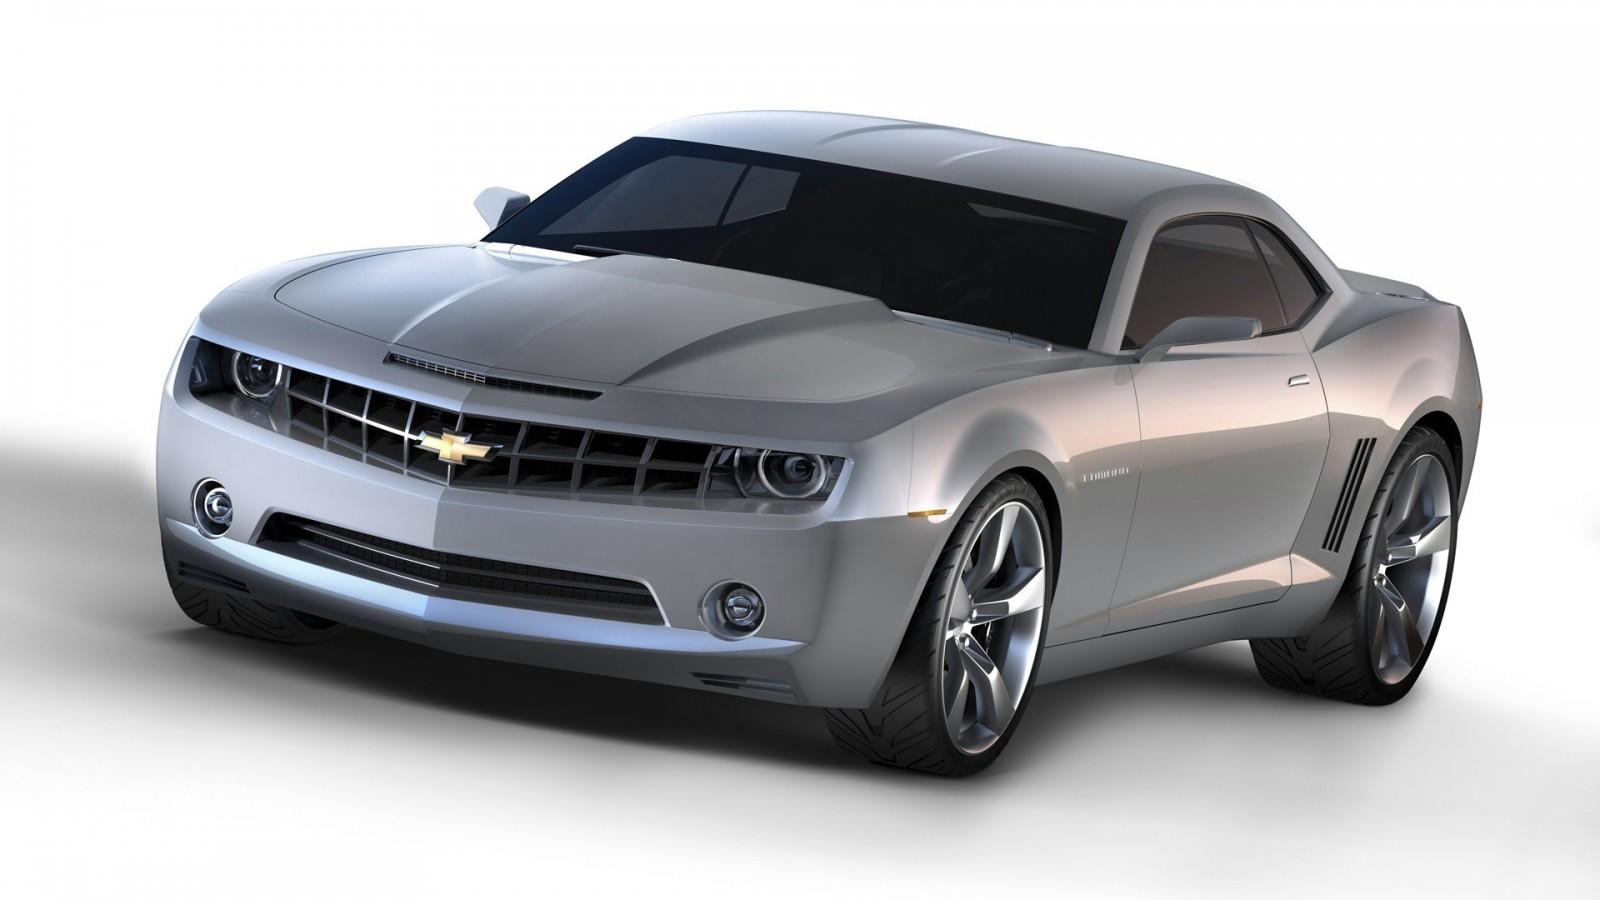 Появился рендер Chevrolet Camaro вкузове Shooting Brake